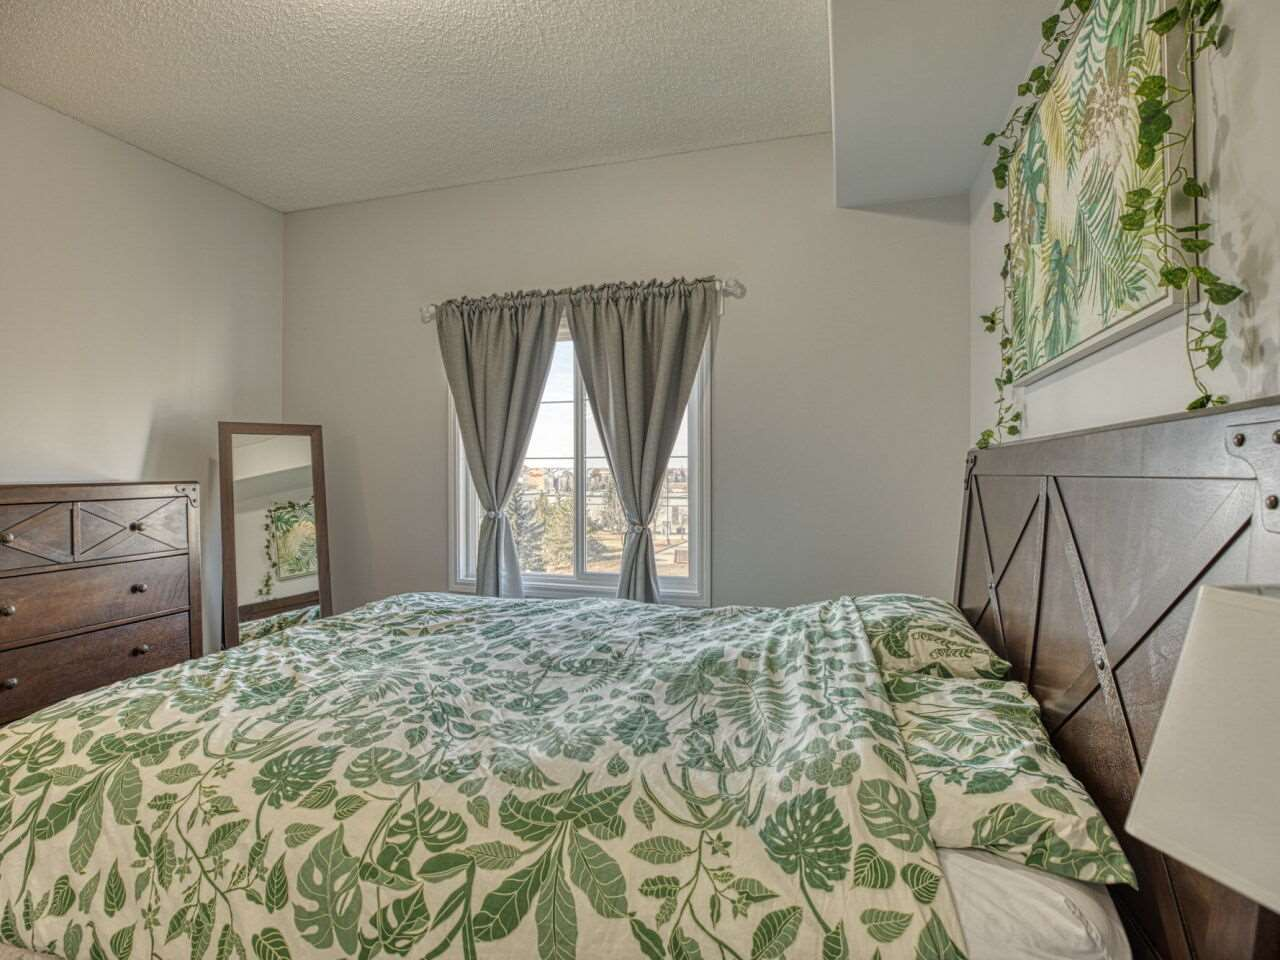 429 16807 100 Avenue - Glenwood_EDMO Lowrise Apartment for sale, 2 Bedrooms (E4234341) #19